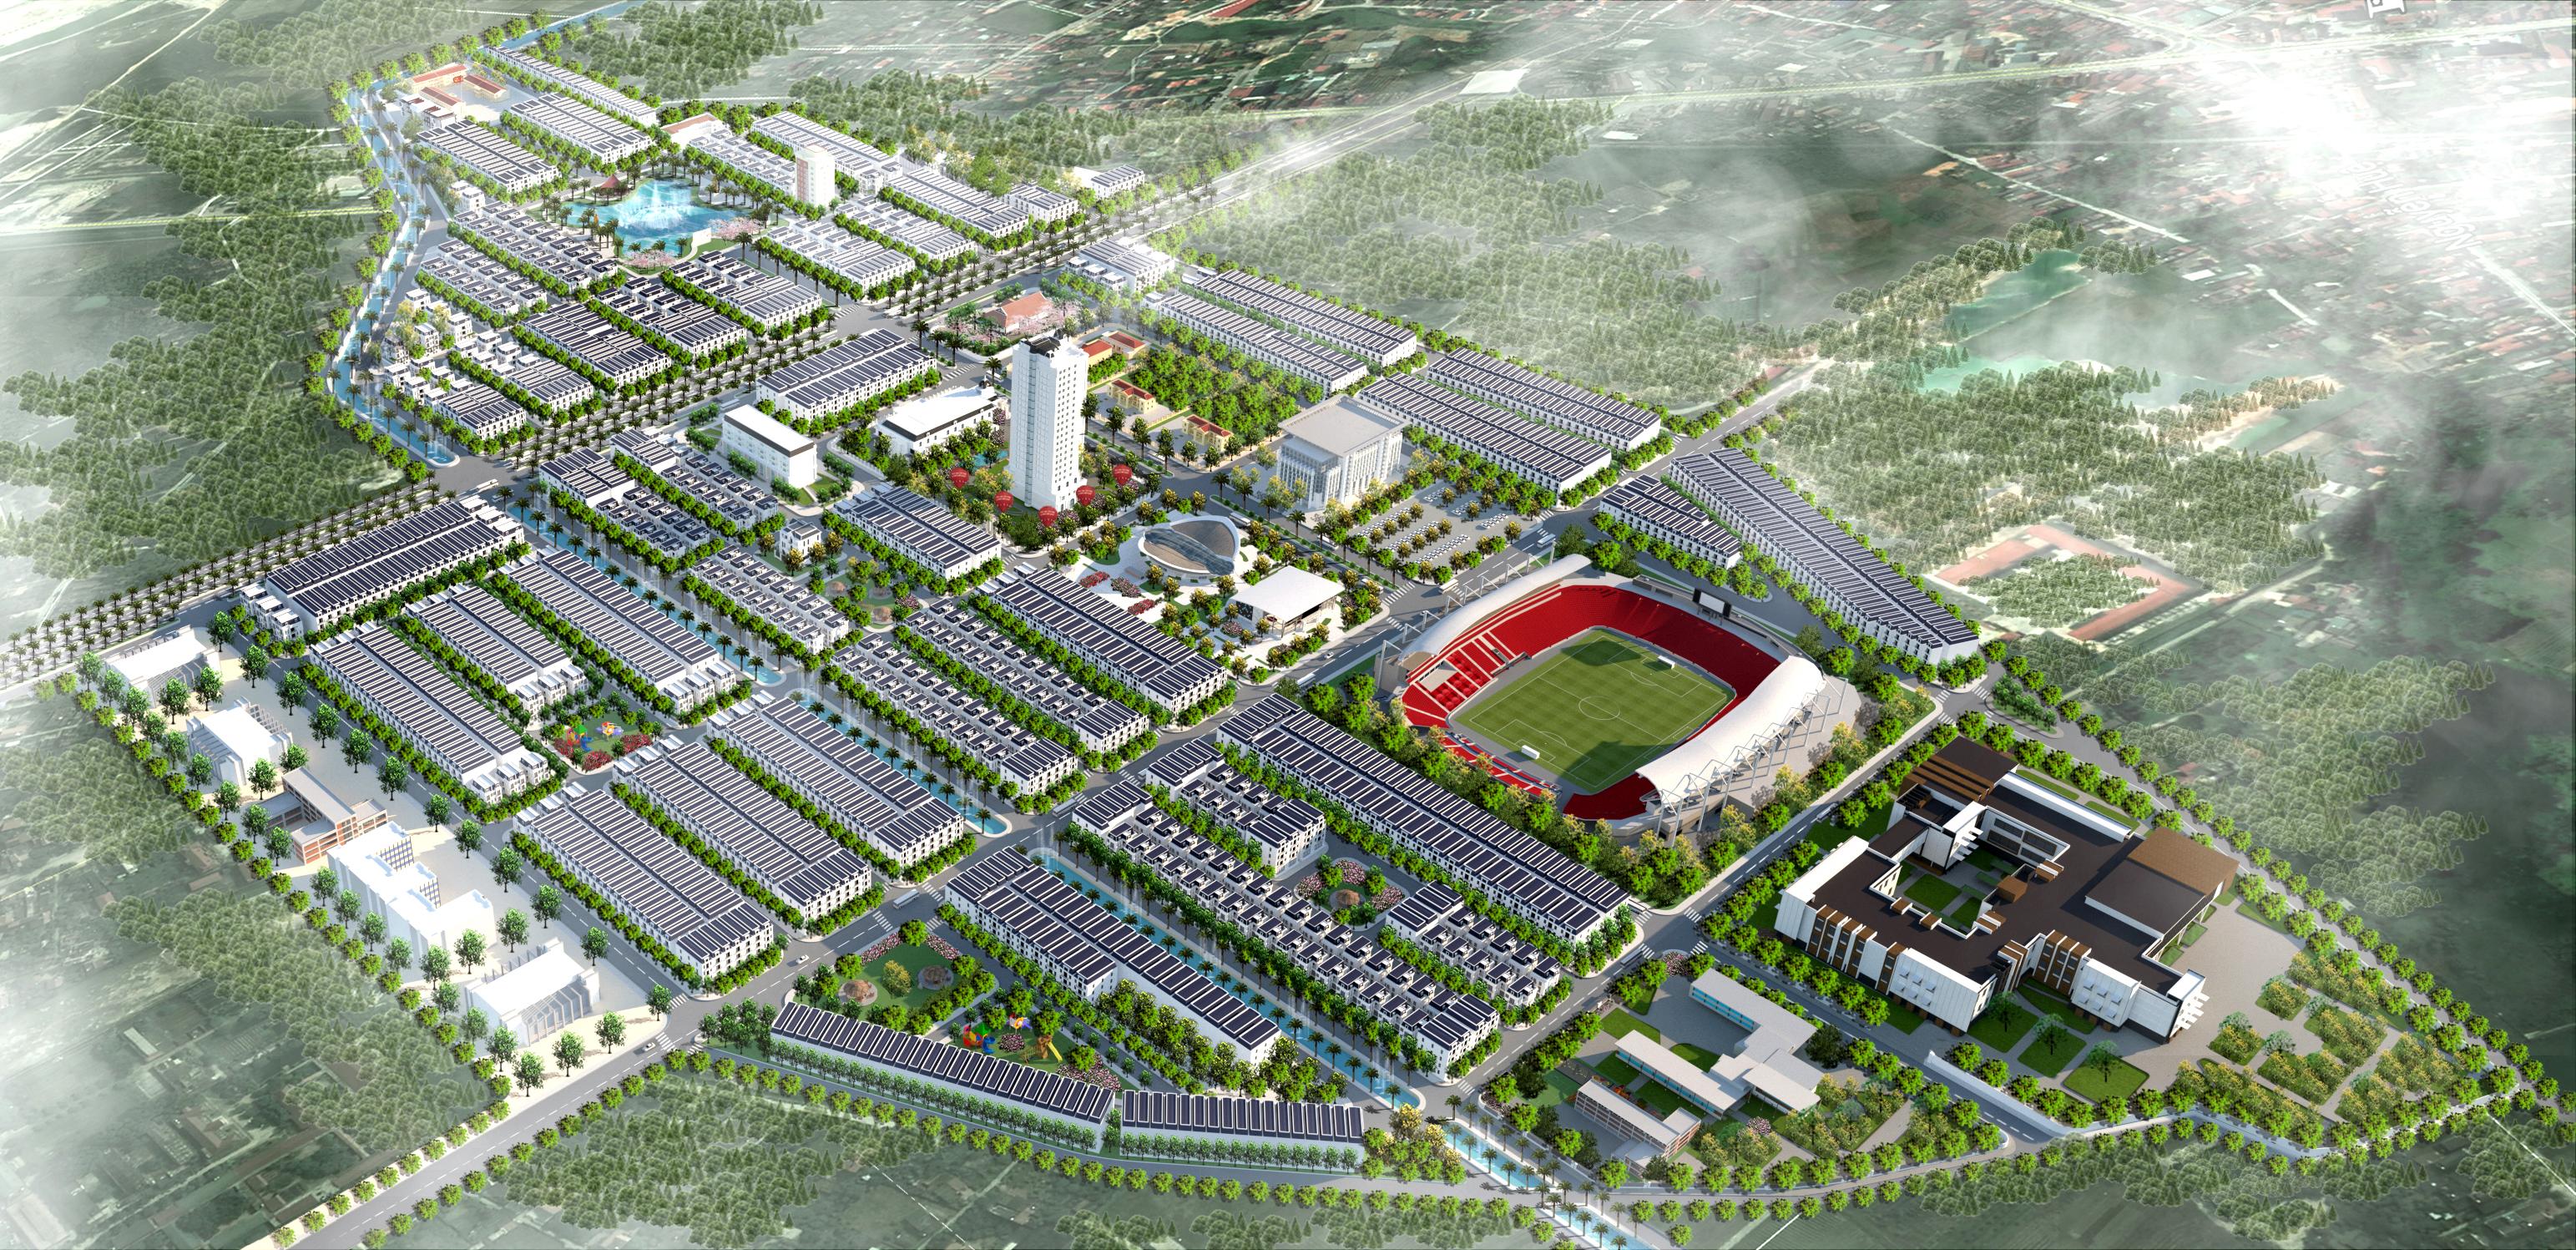 Phối cảnh Flycam Dự án Chí Linh Palm City Chí Linh Hải Dương